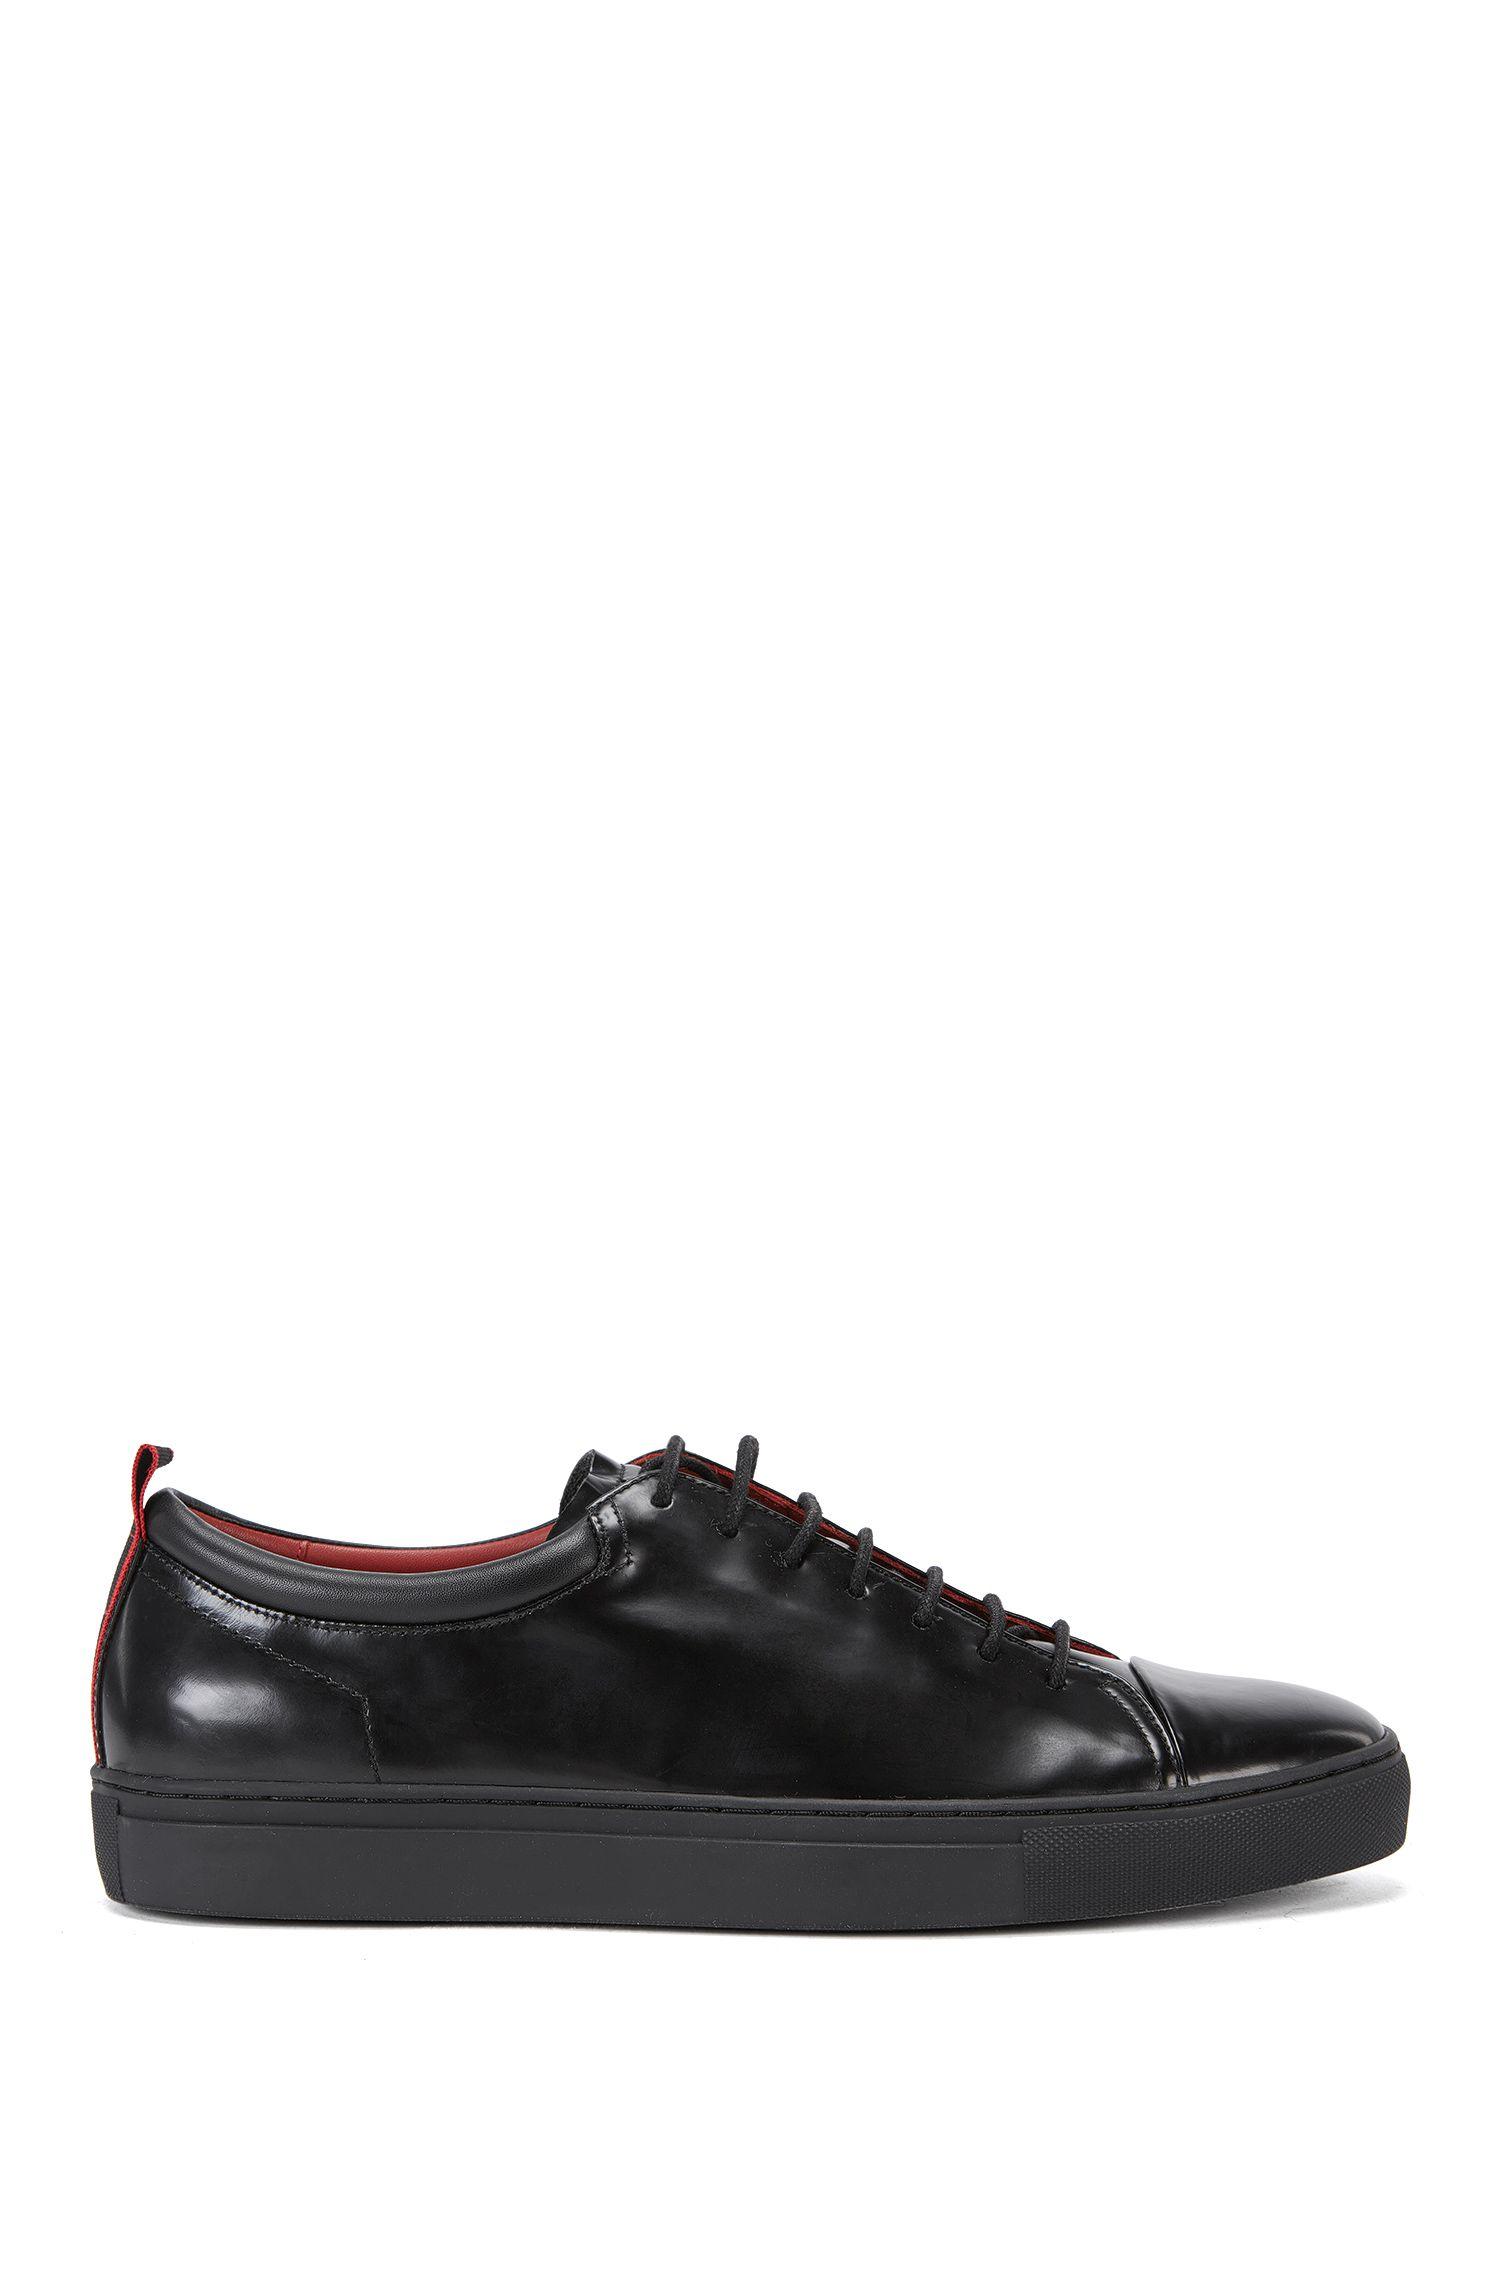 Leather Tennis Shoe | Casual Fut Tenn Boct